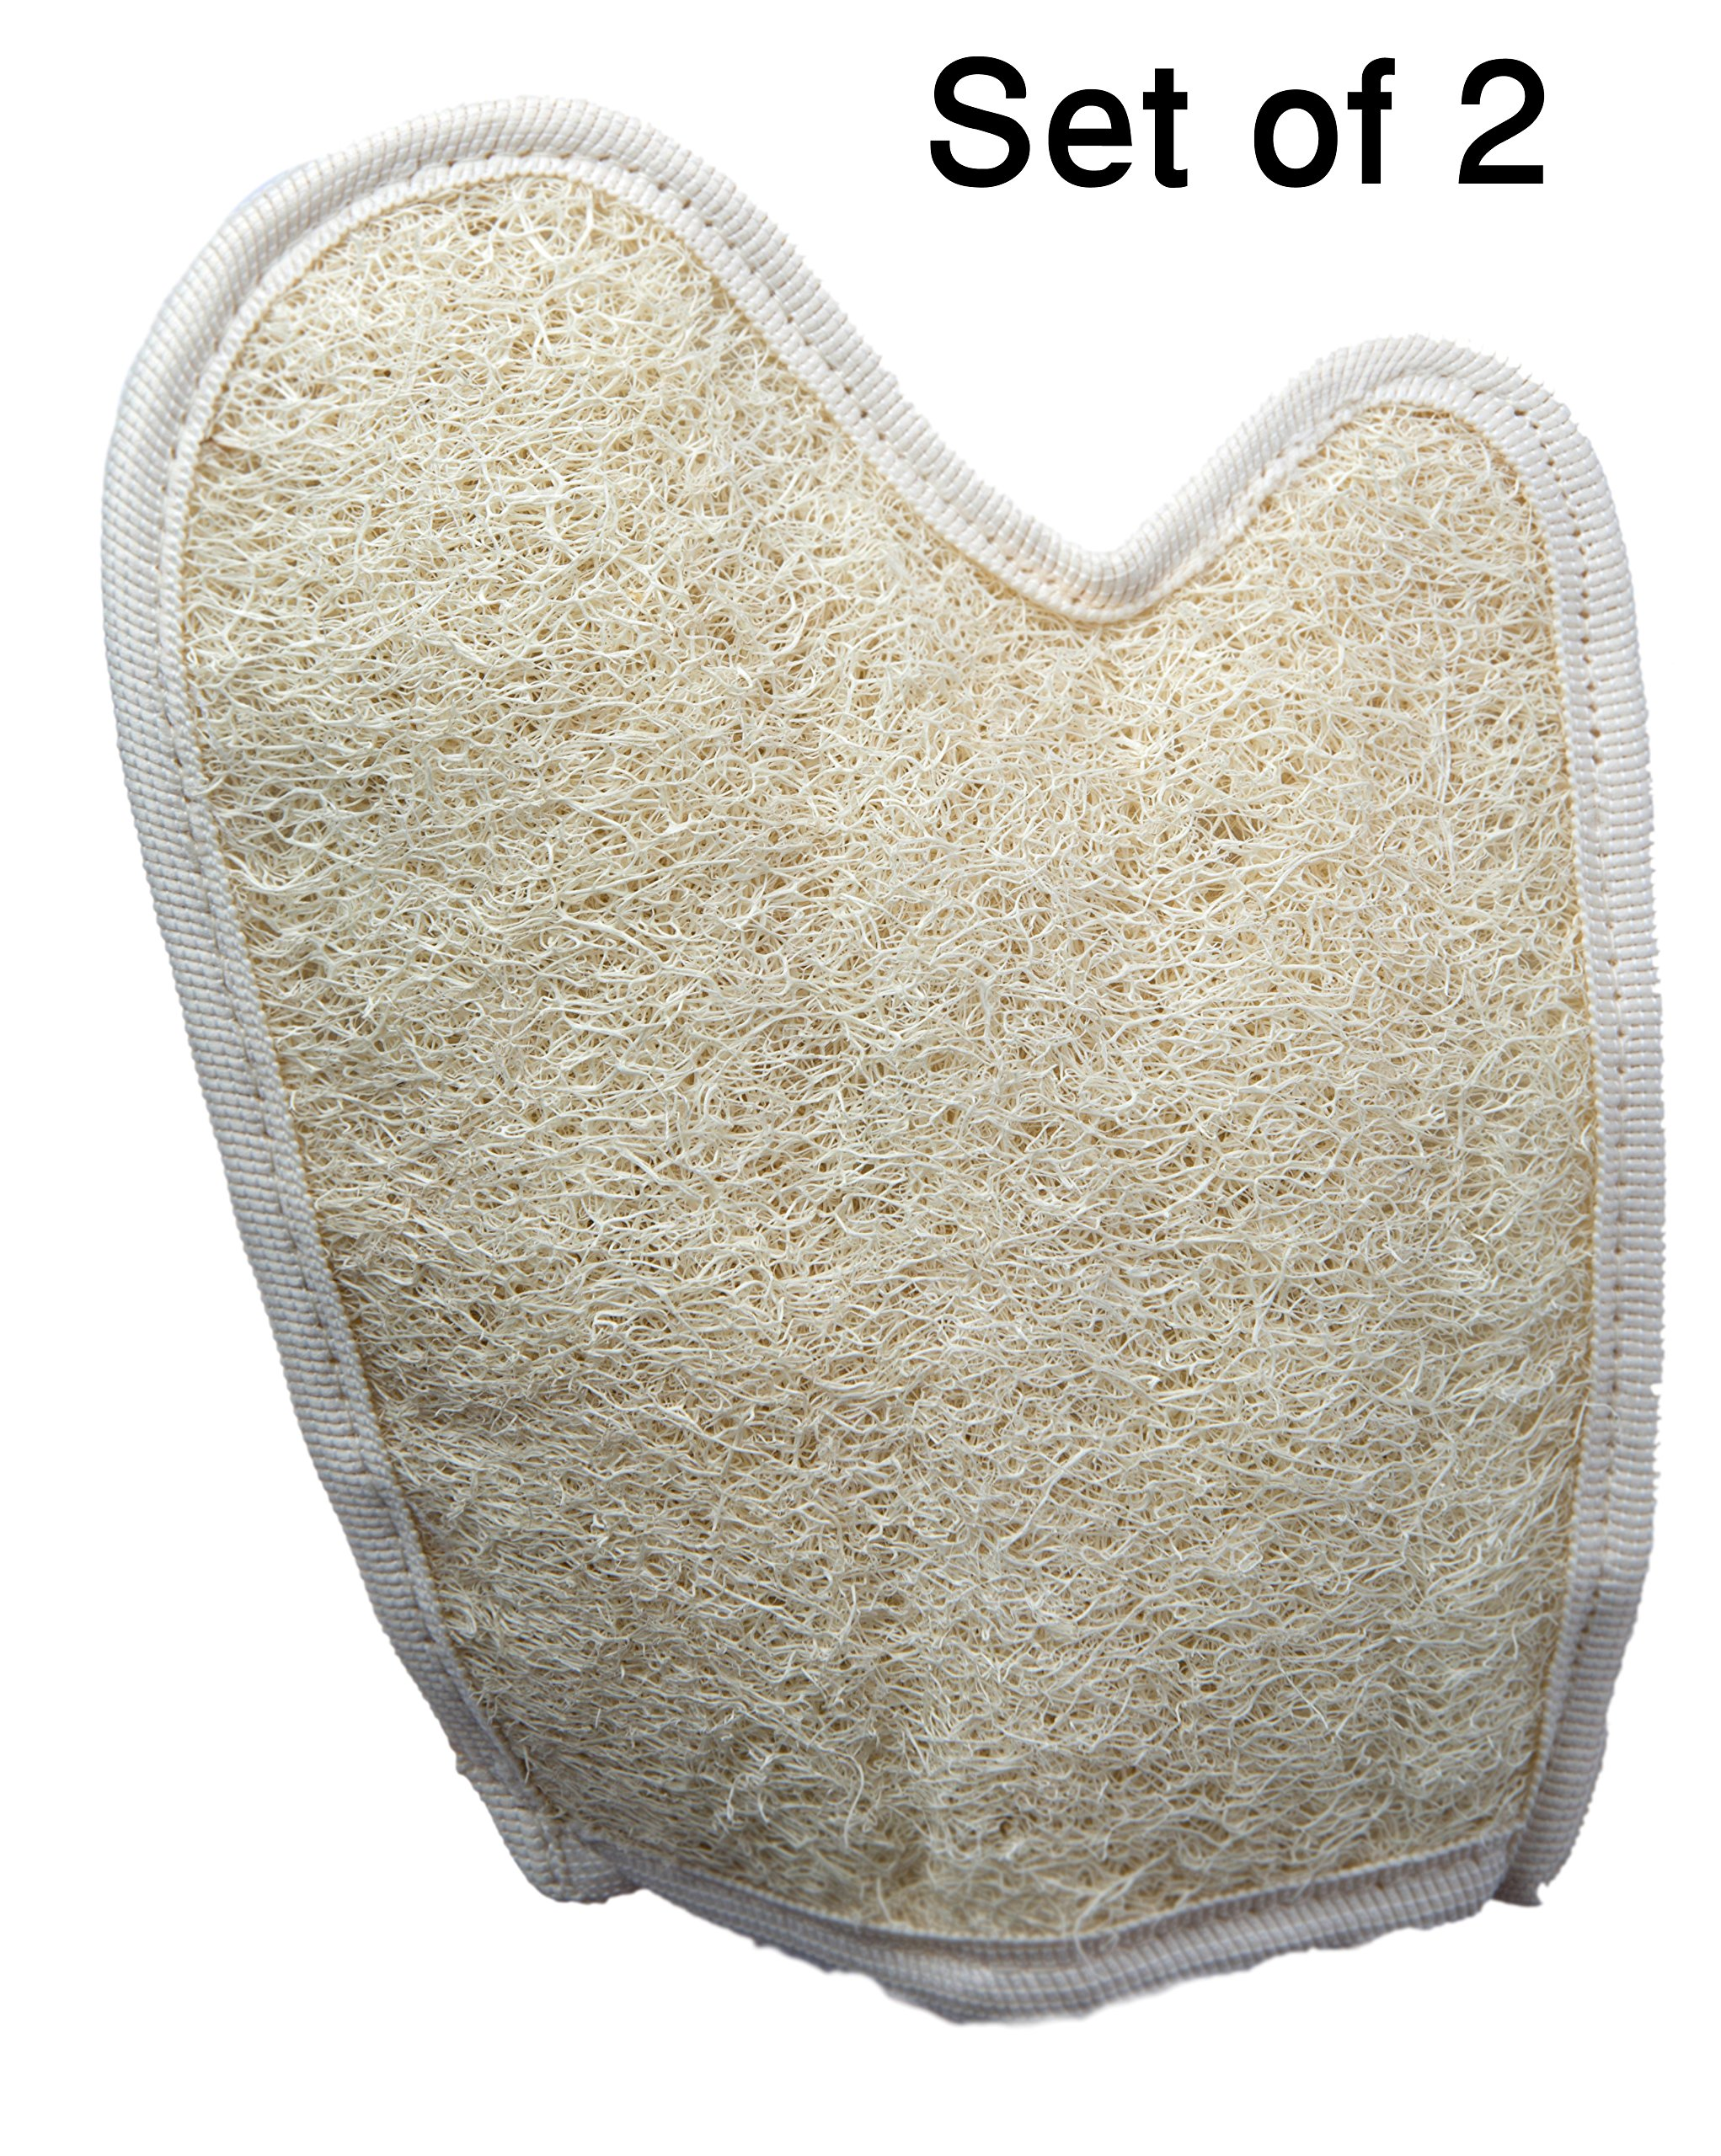 Exfoliating Egyptian Loofah Glove/Pad - 2 Pack 100% Natural SPA Beauty - Bath Sponge Body Puff Scrubber - Premium Quality Lofa Loofa Luffa Loffa for exfoliating Your Skin.